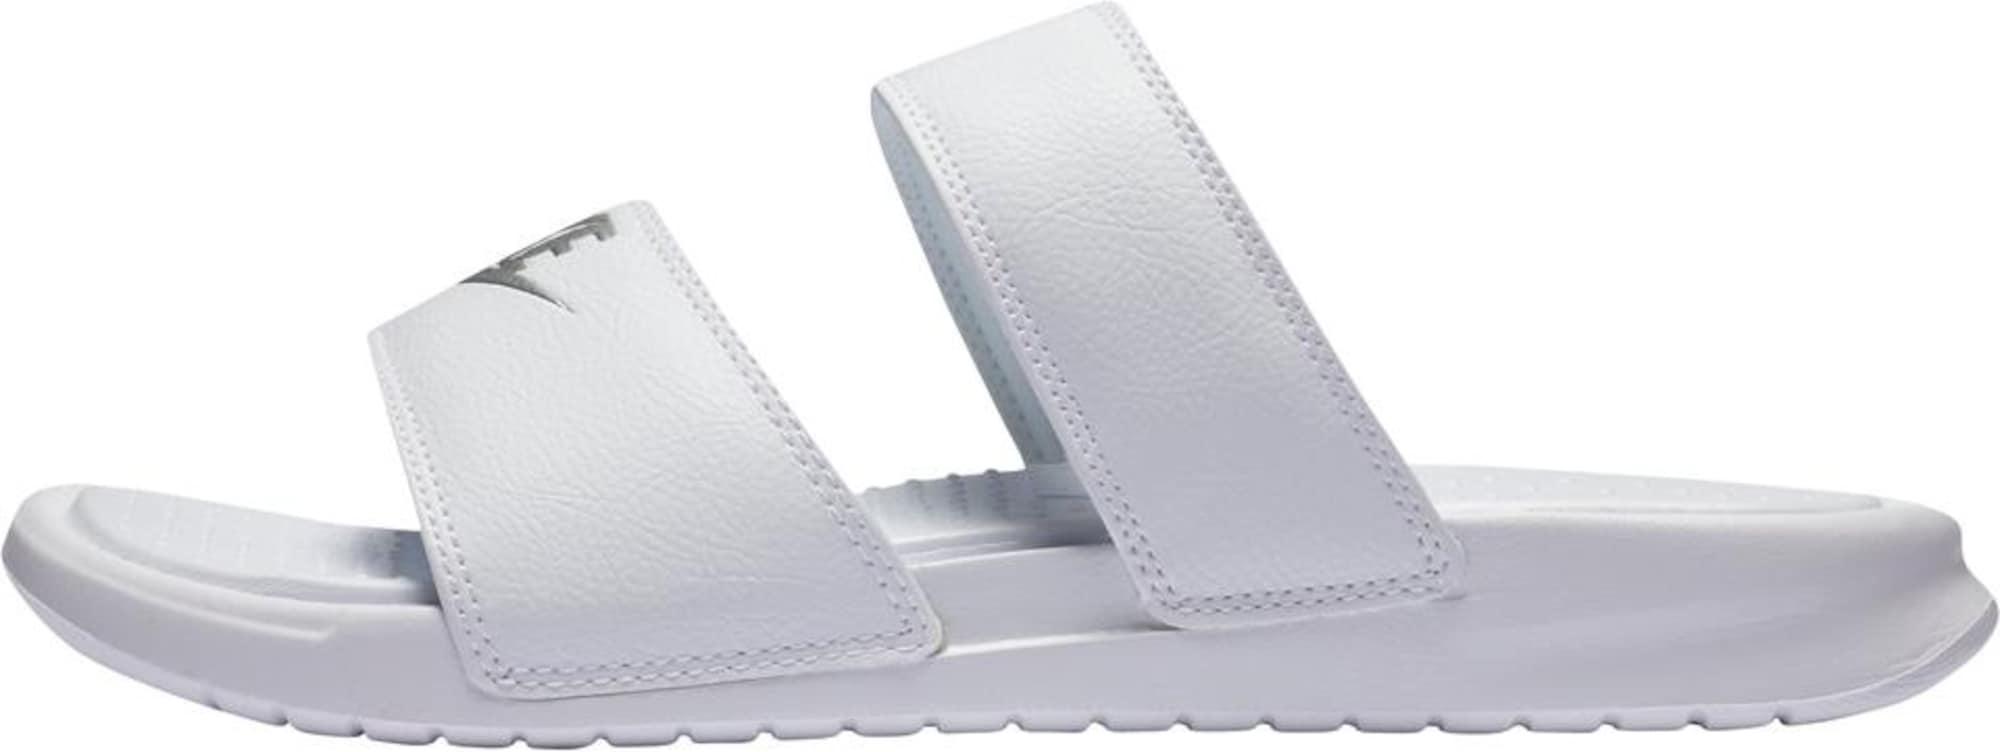 nike sportswear - Badesandale »Benassi Duo Ultra Slide«